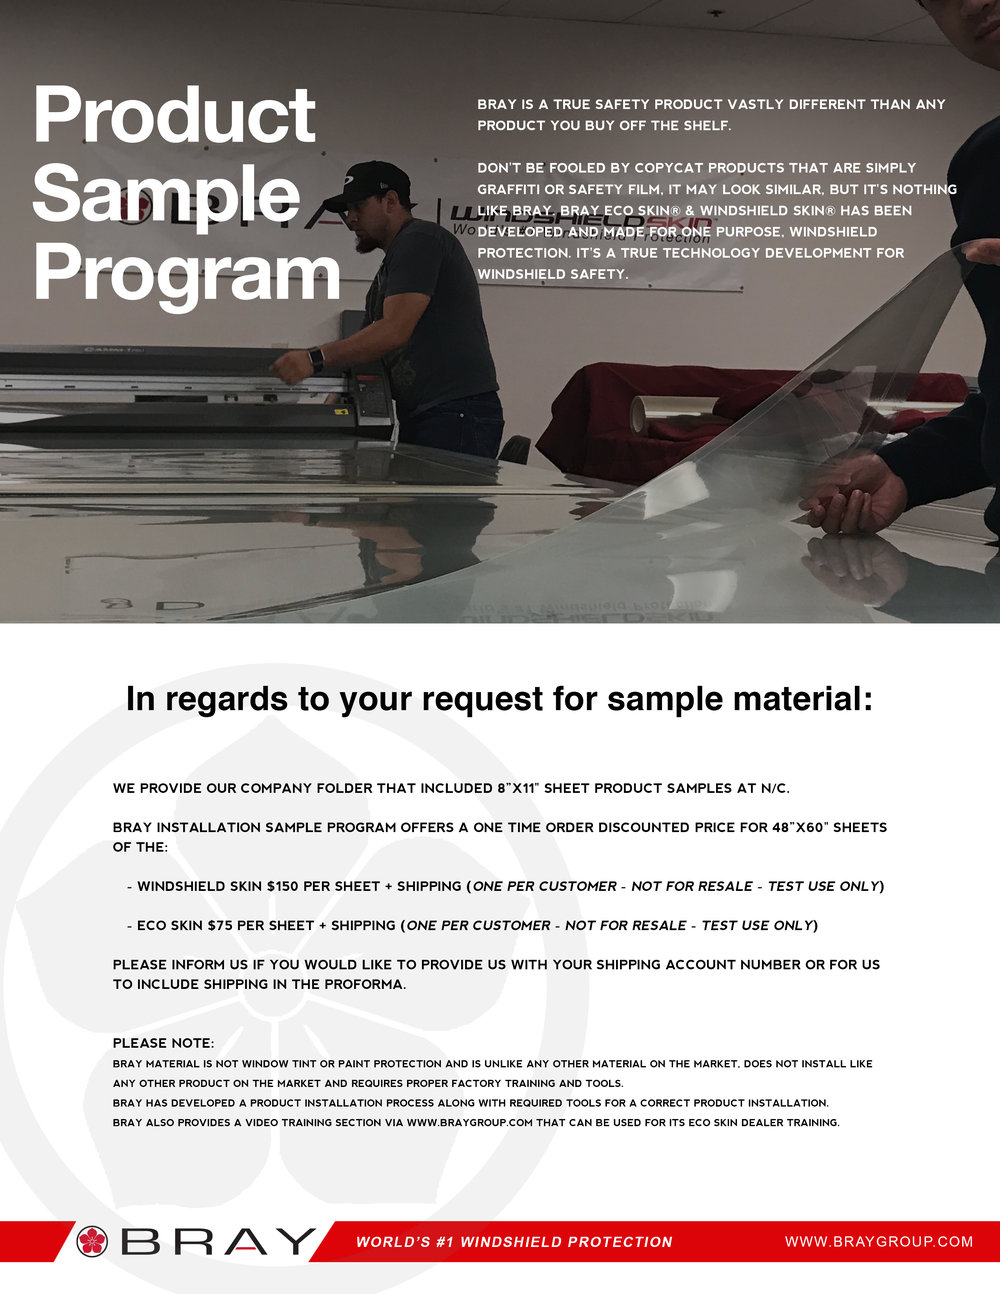 sales_sheet - Sample Program.jpg